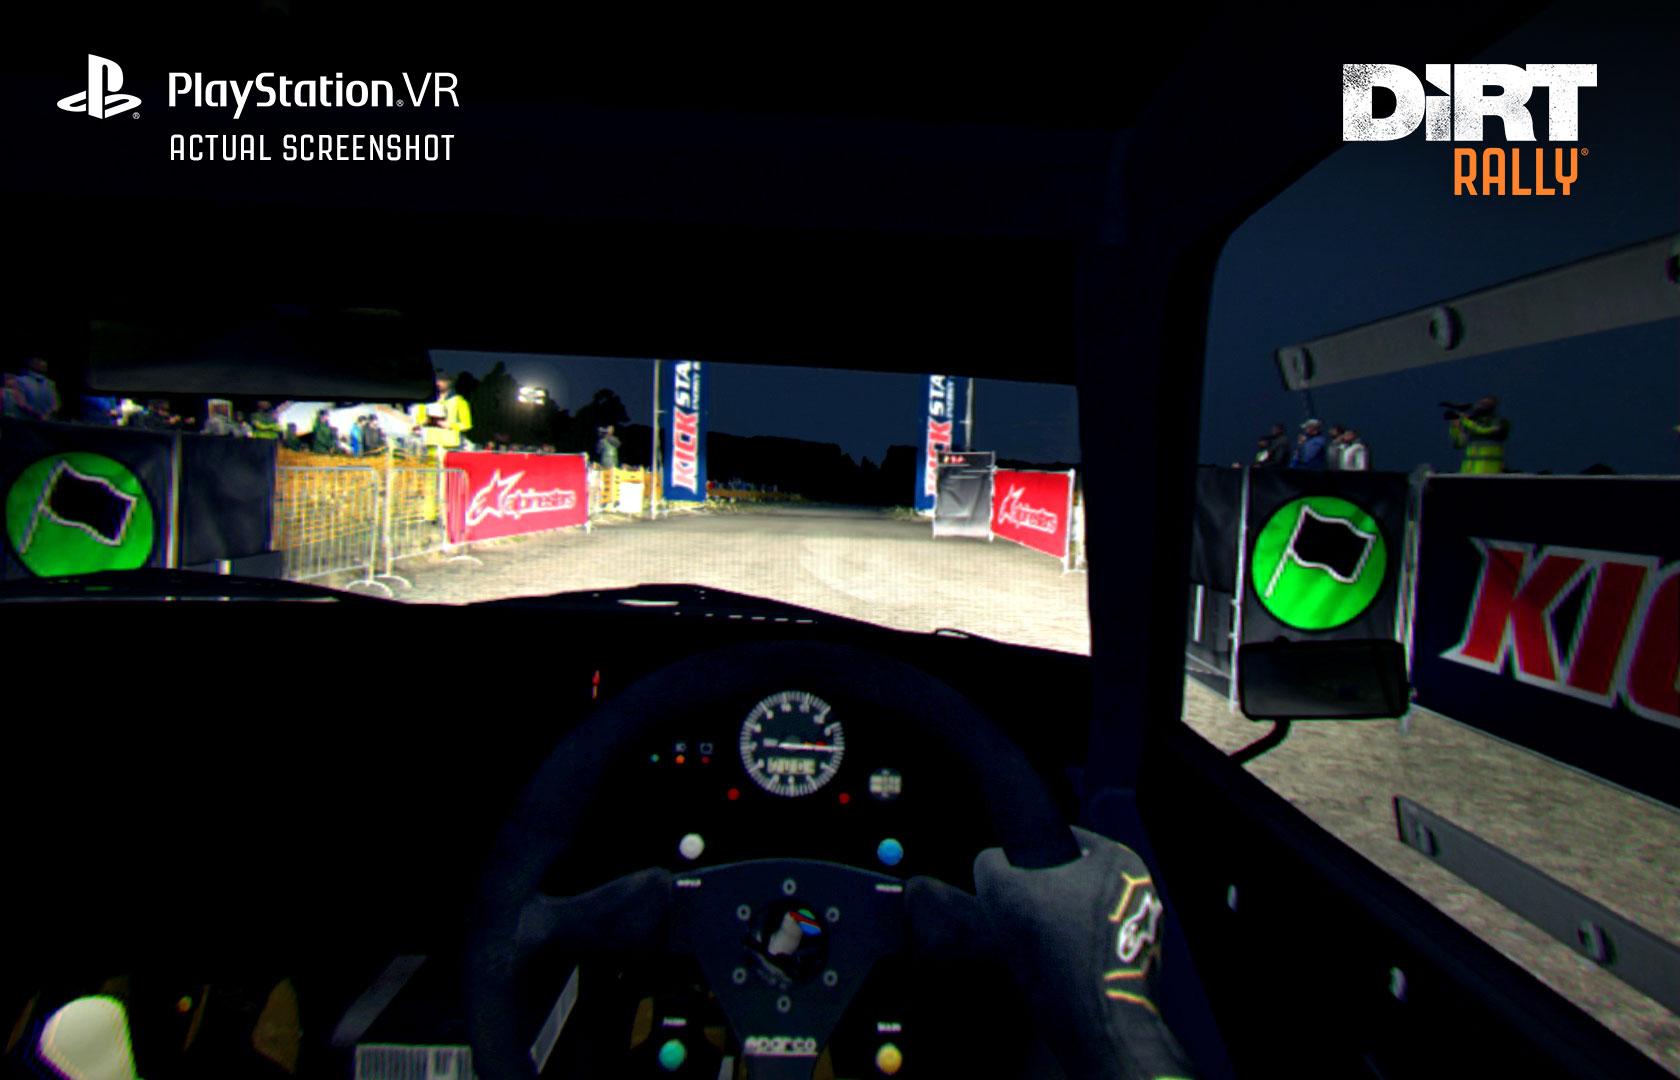 DiRT Rally PSVR screenshot 2